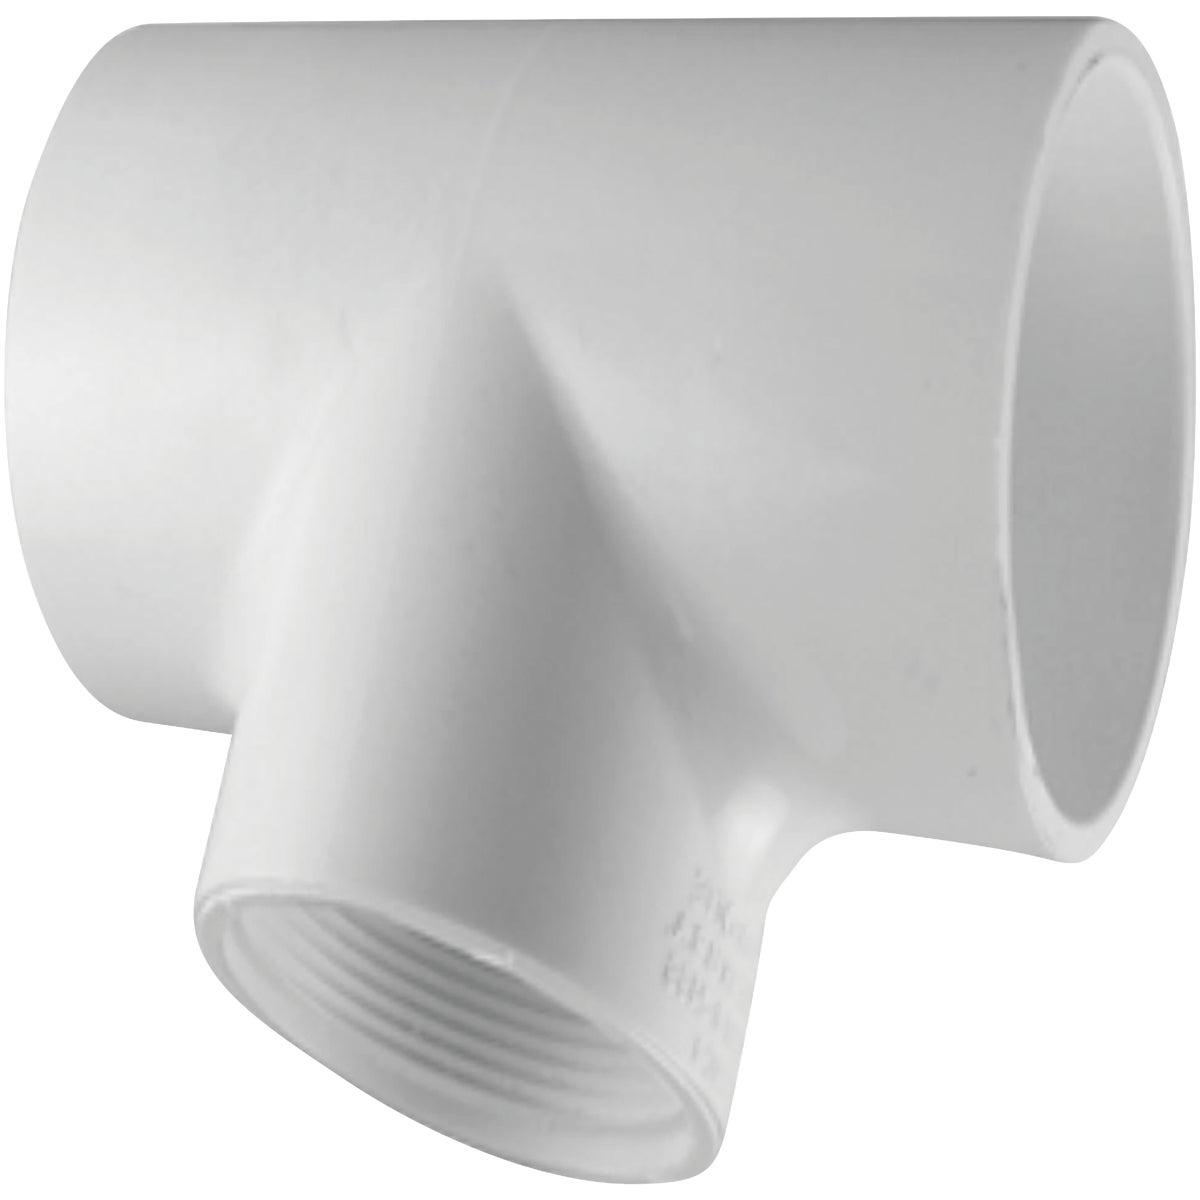 "1"" SCH40 PVC SXFIP TEE"